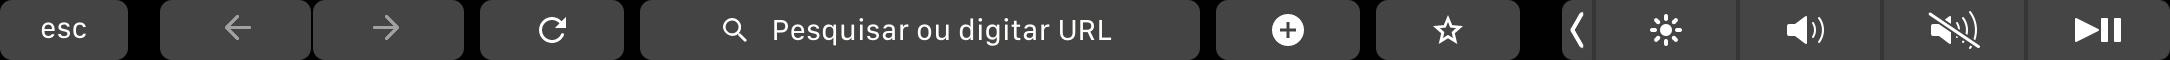 Google Chrome na Touch Bar